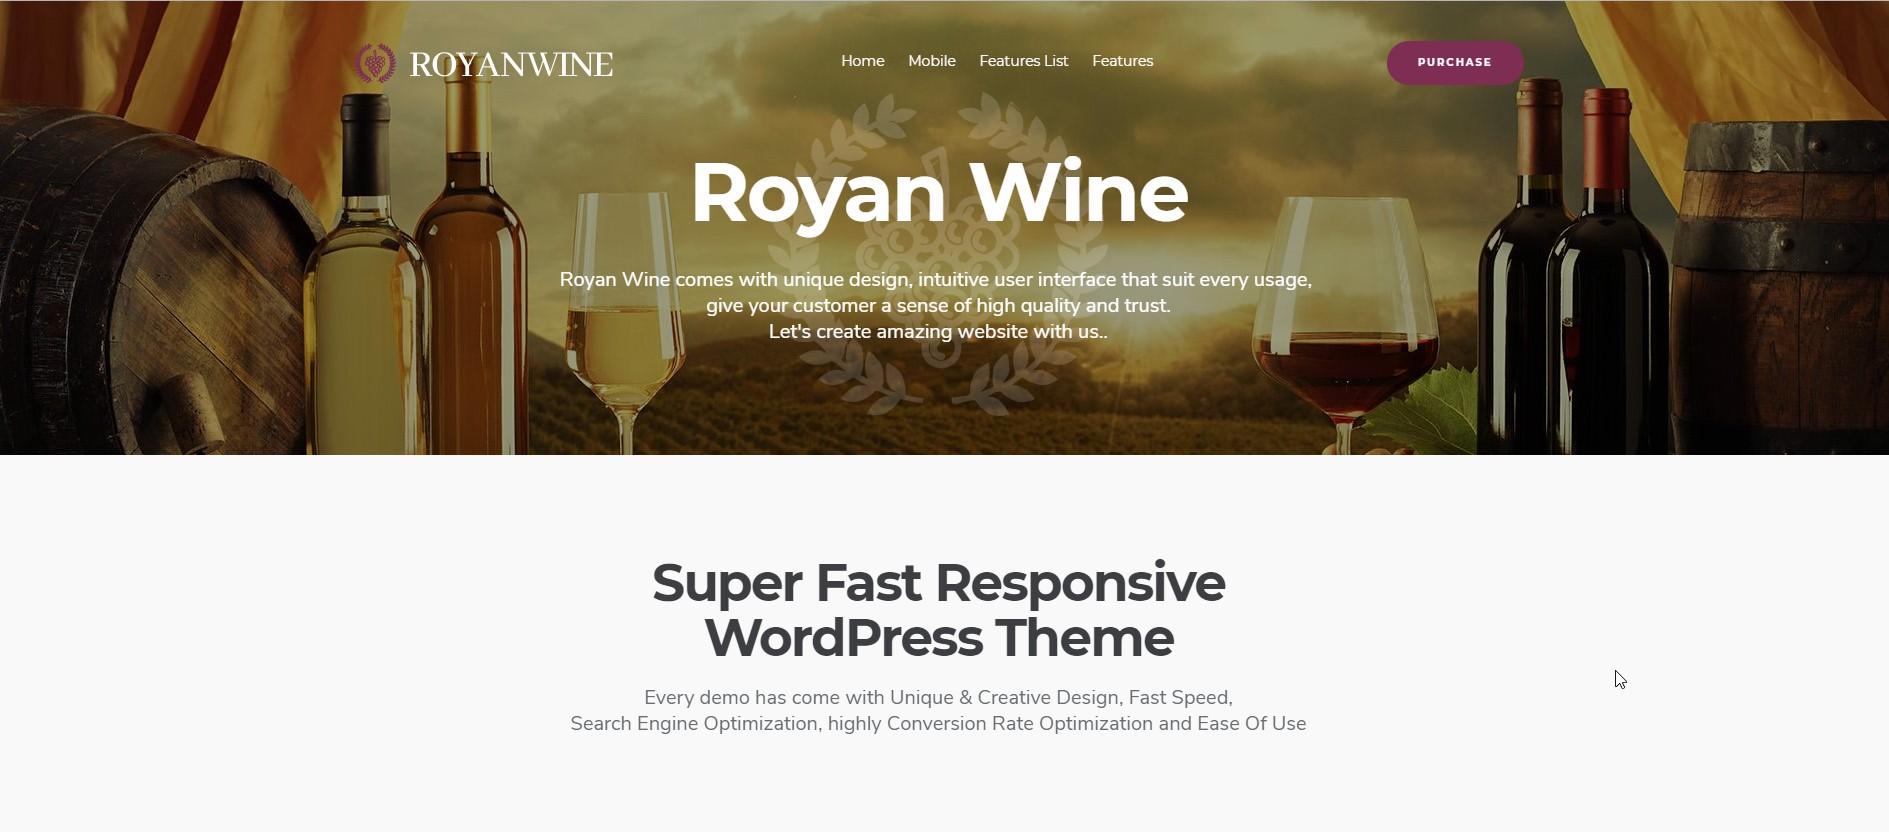 Royan Wine Vineyard, Winery, Wine Shop and Dairy Farm WordPress Theme